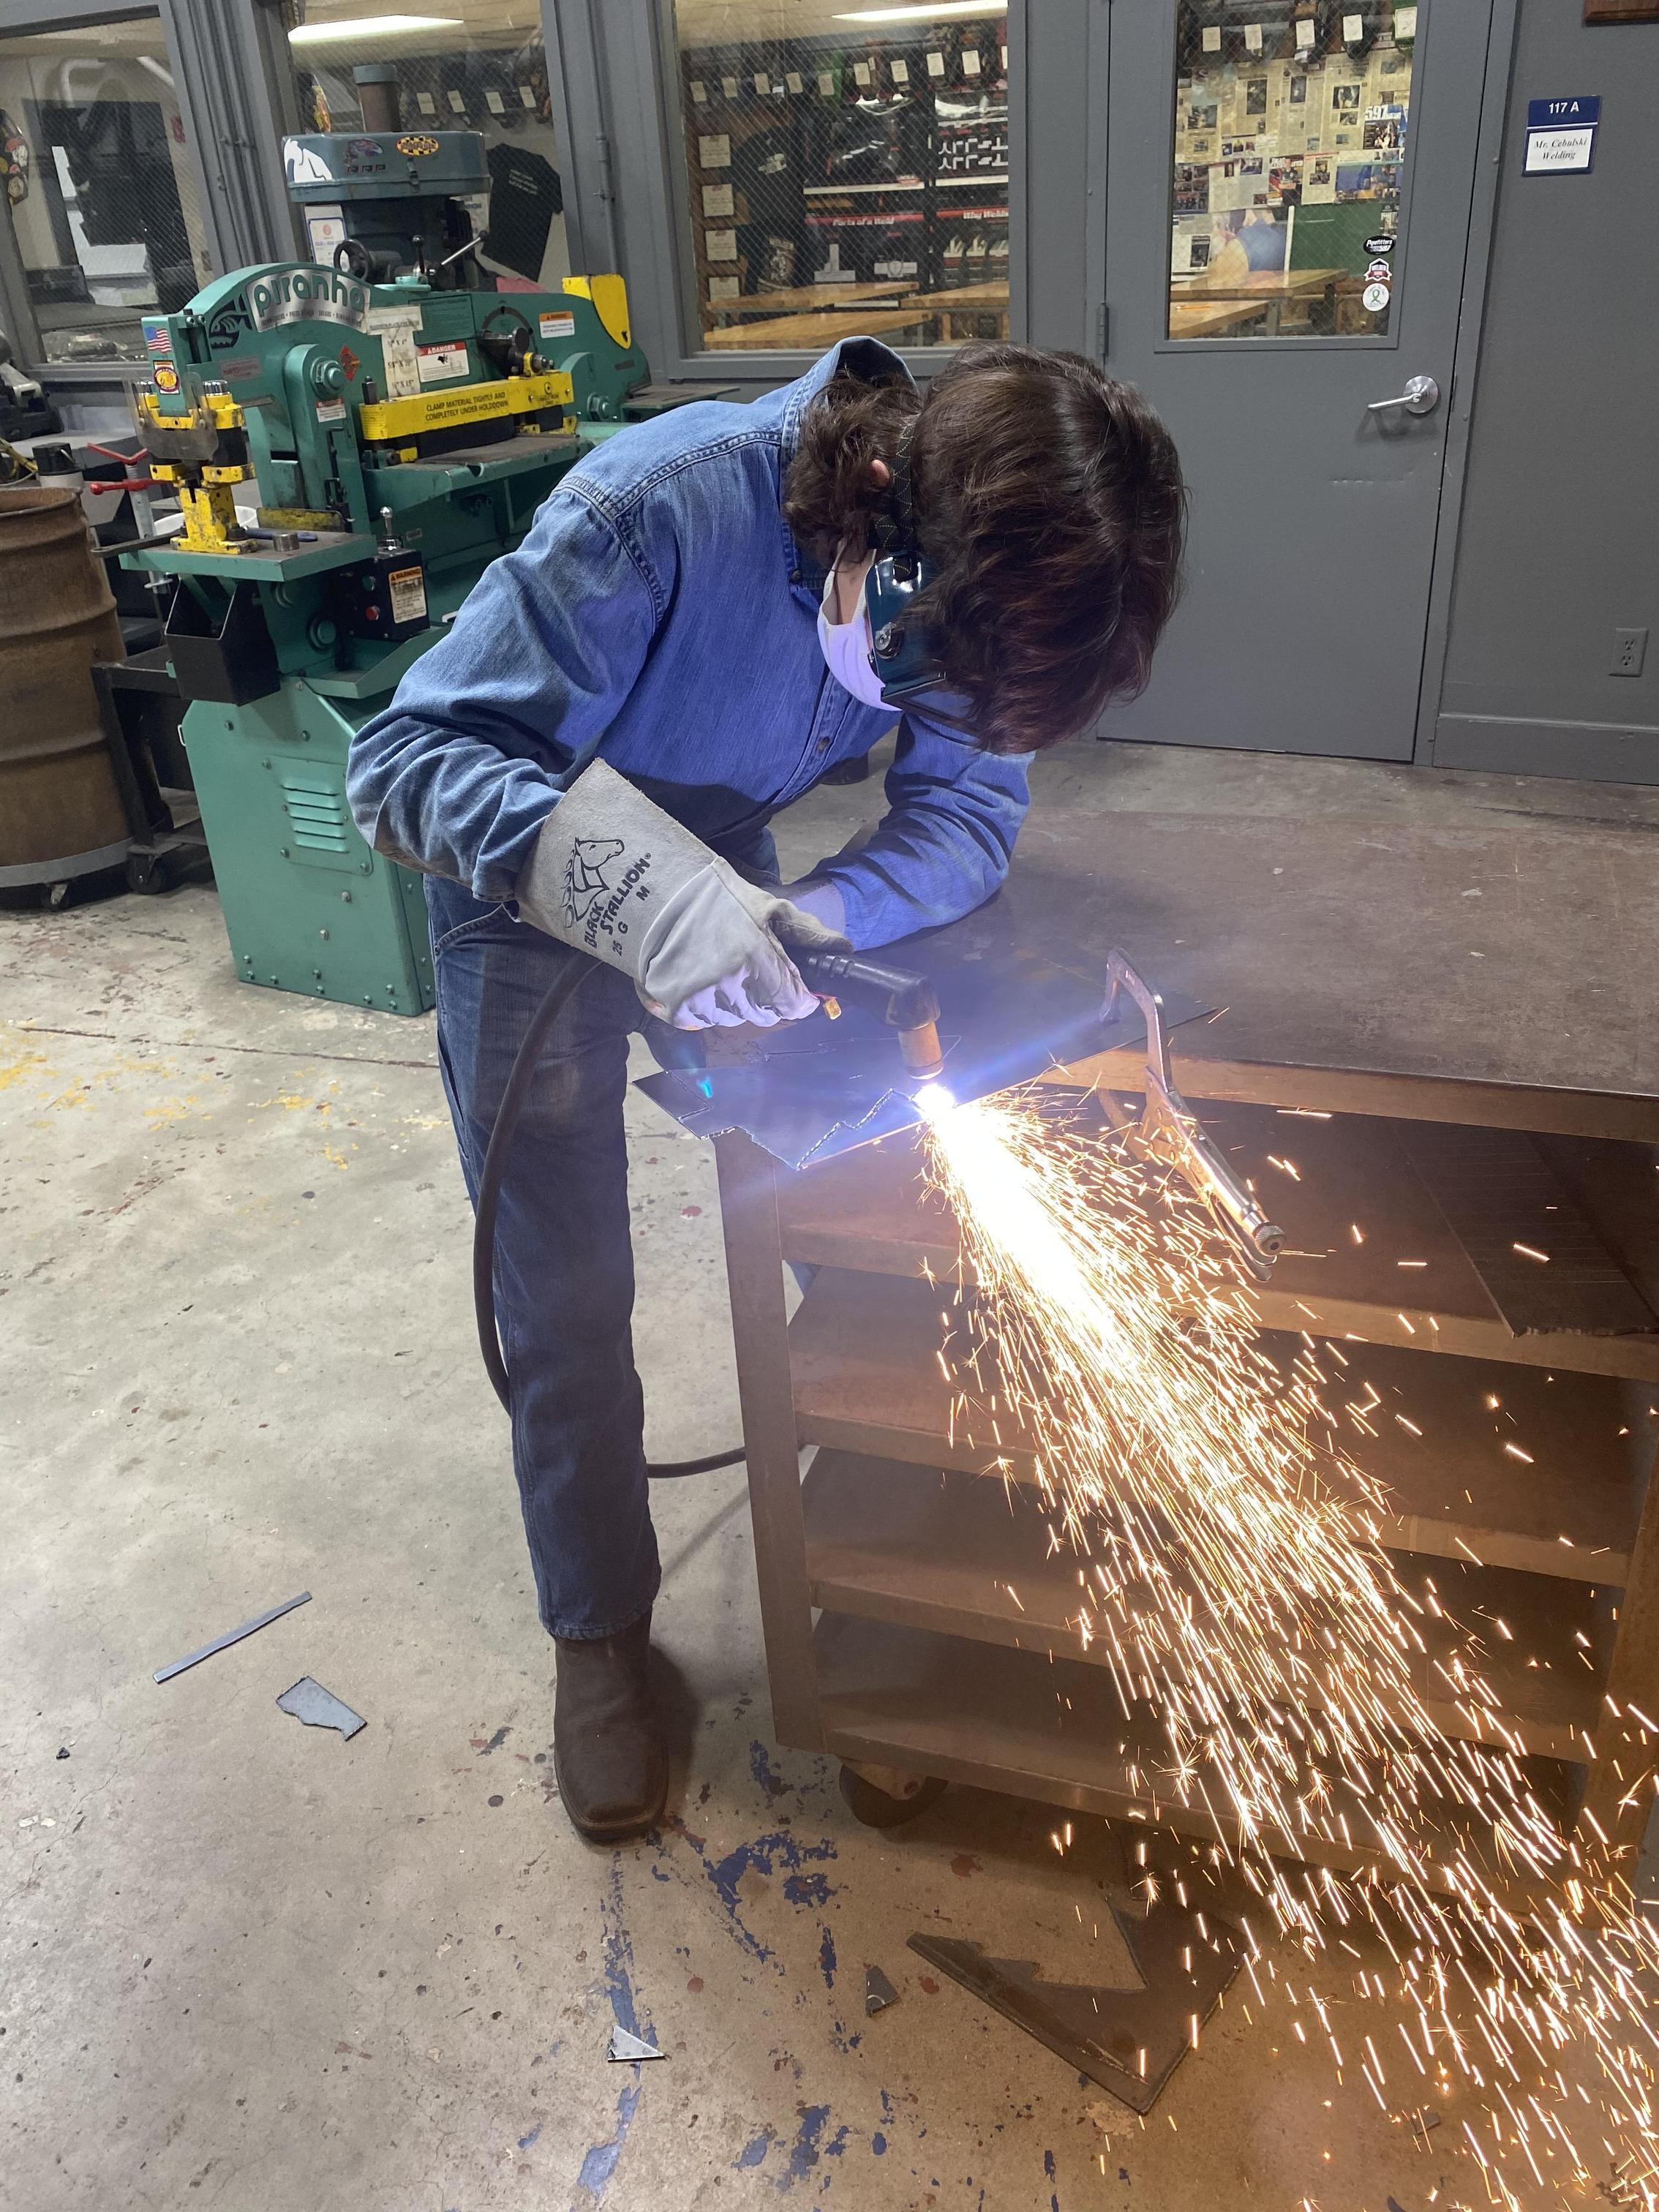 Student plasma cutting.